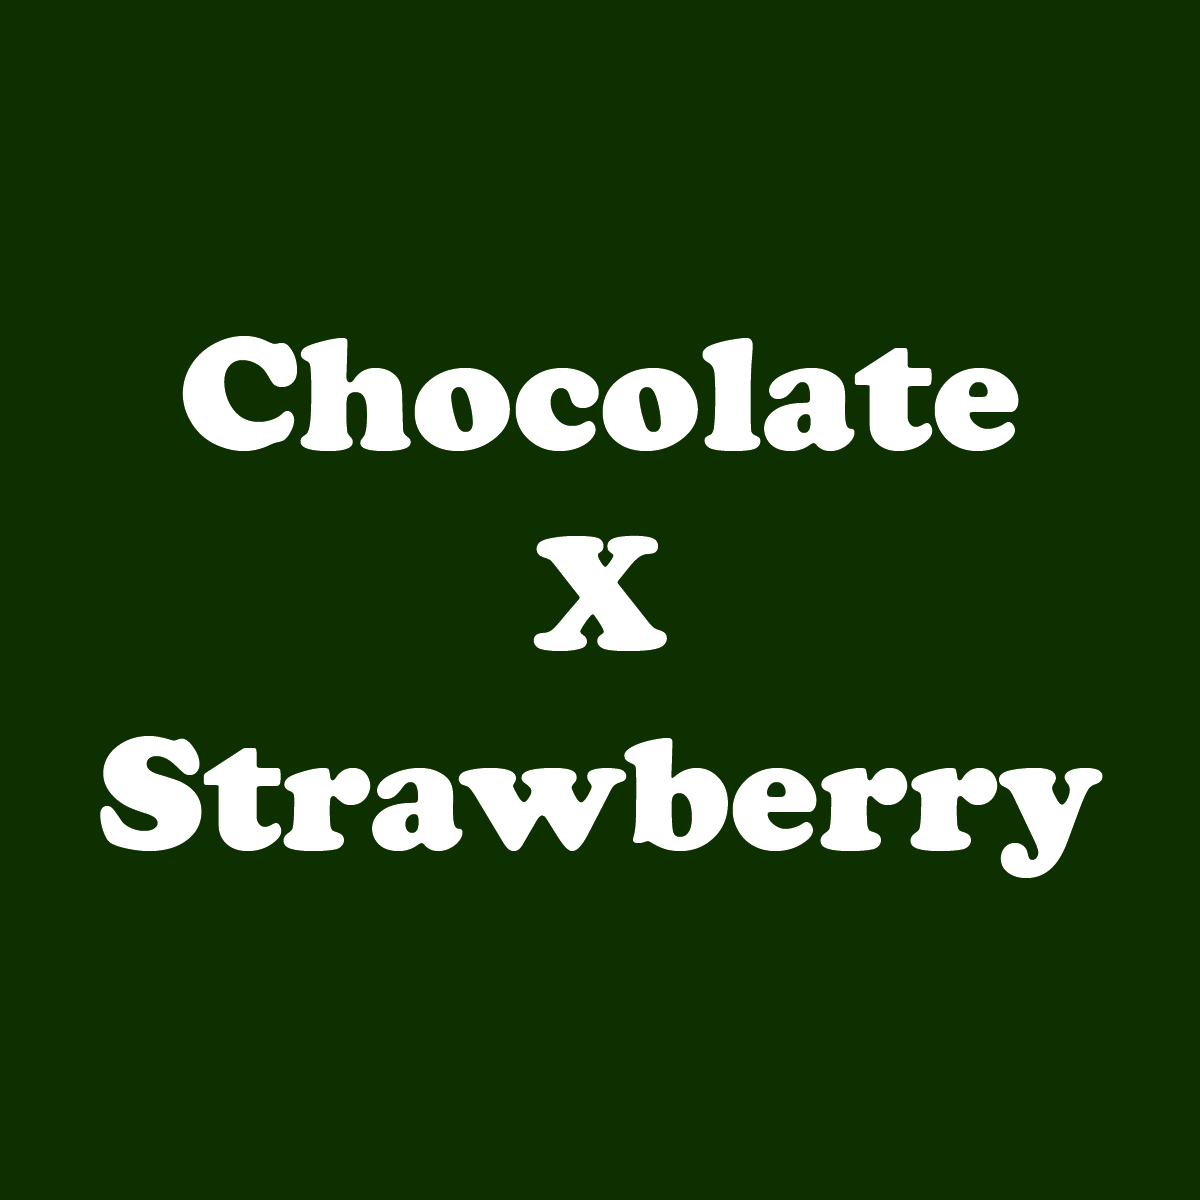 ChocolateXStrawberry.jpg